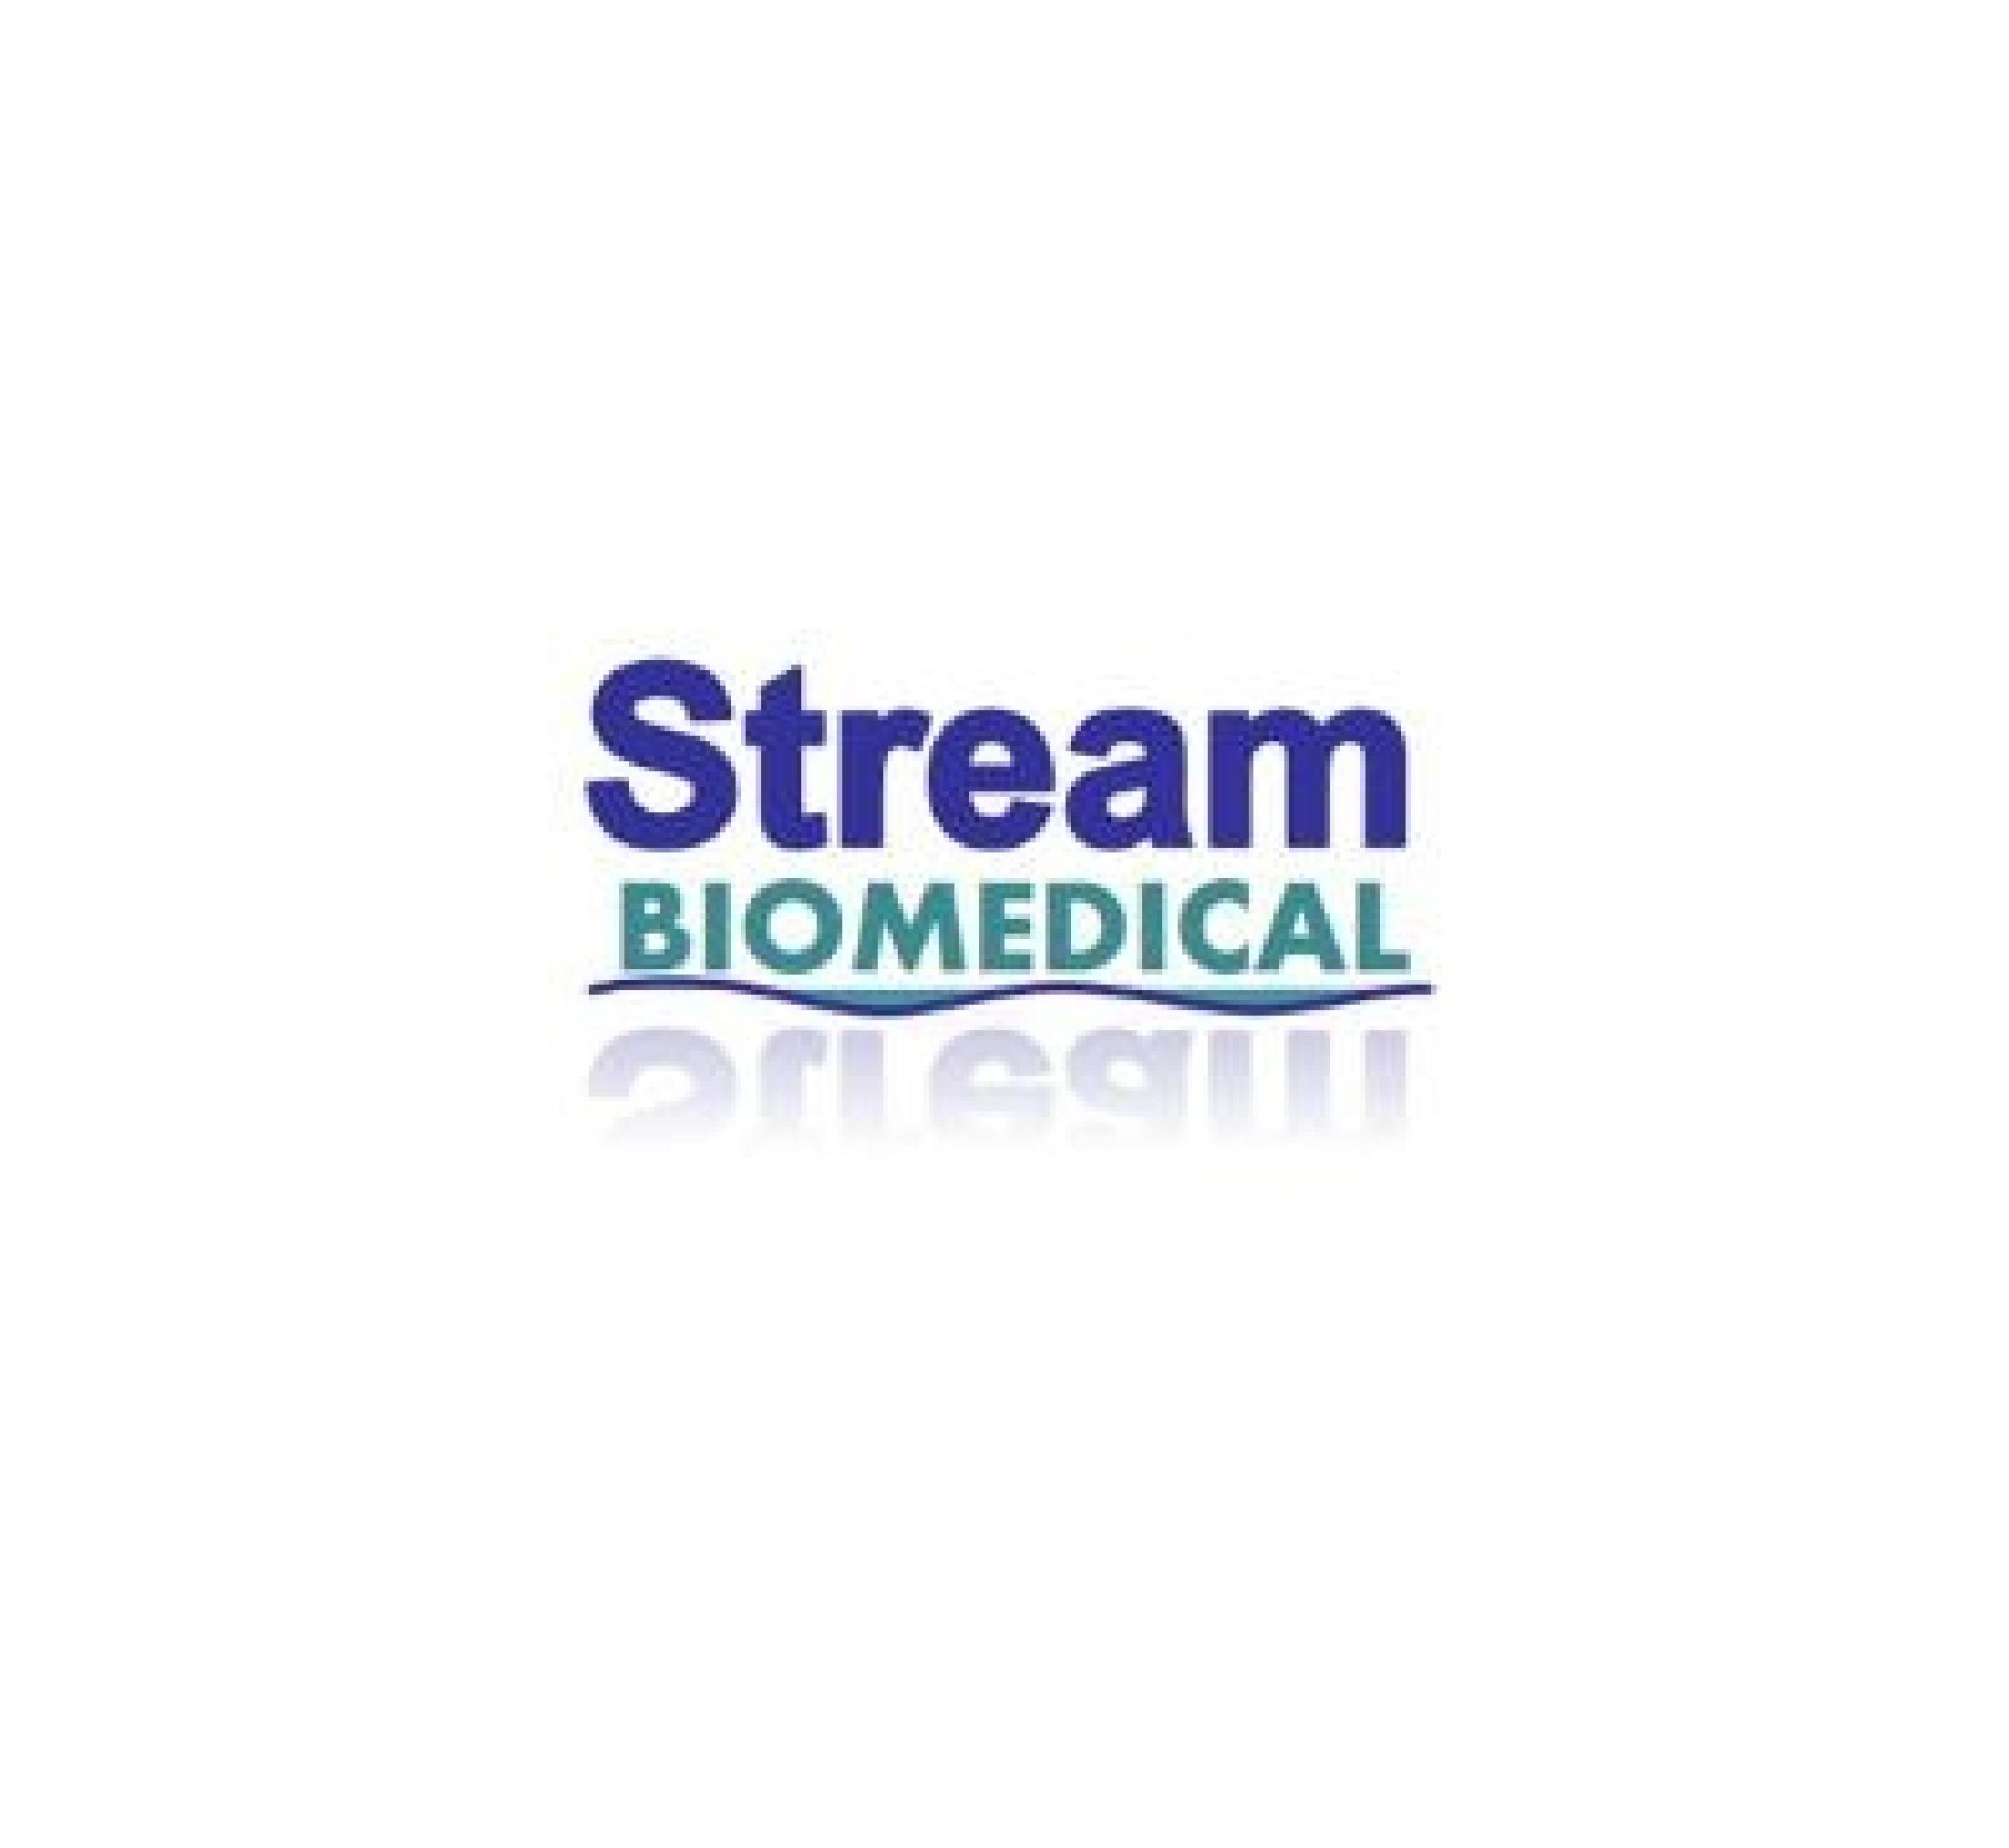 streamwebready.png